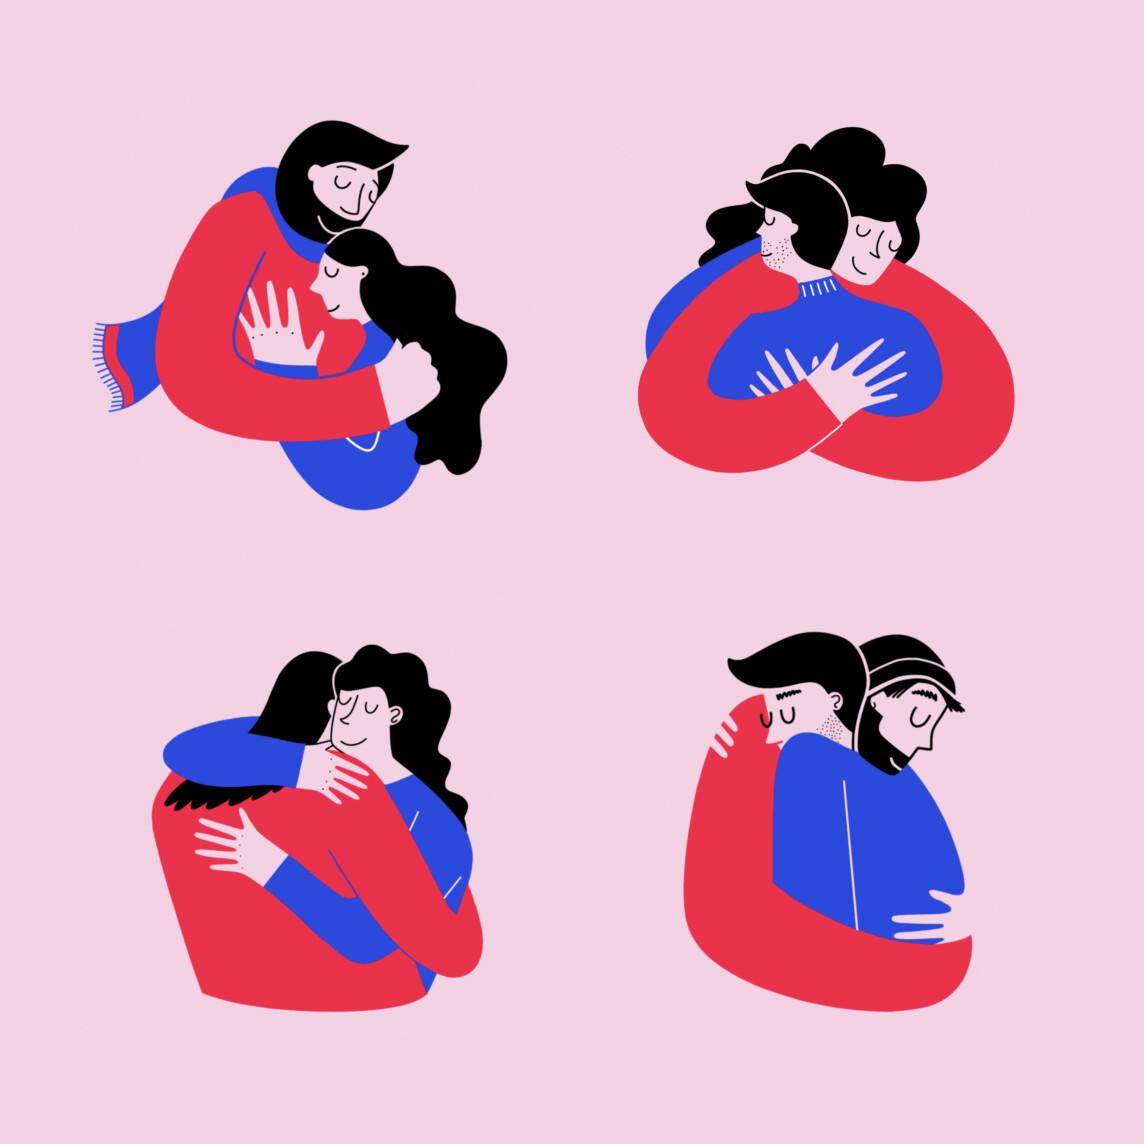 Illu Hugs